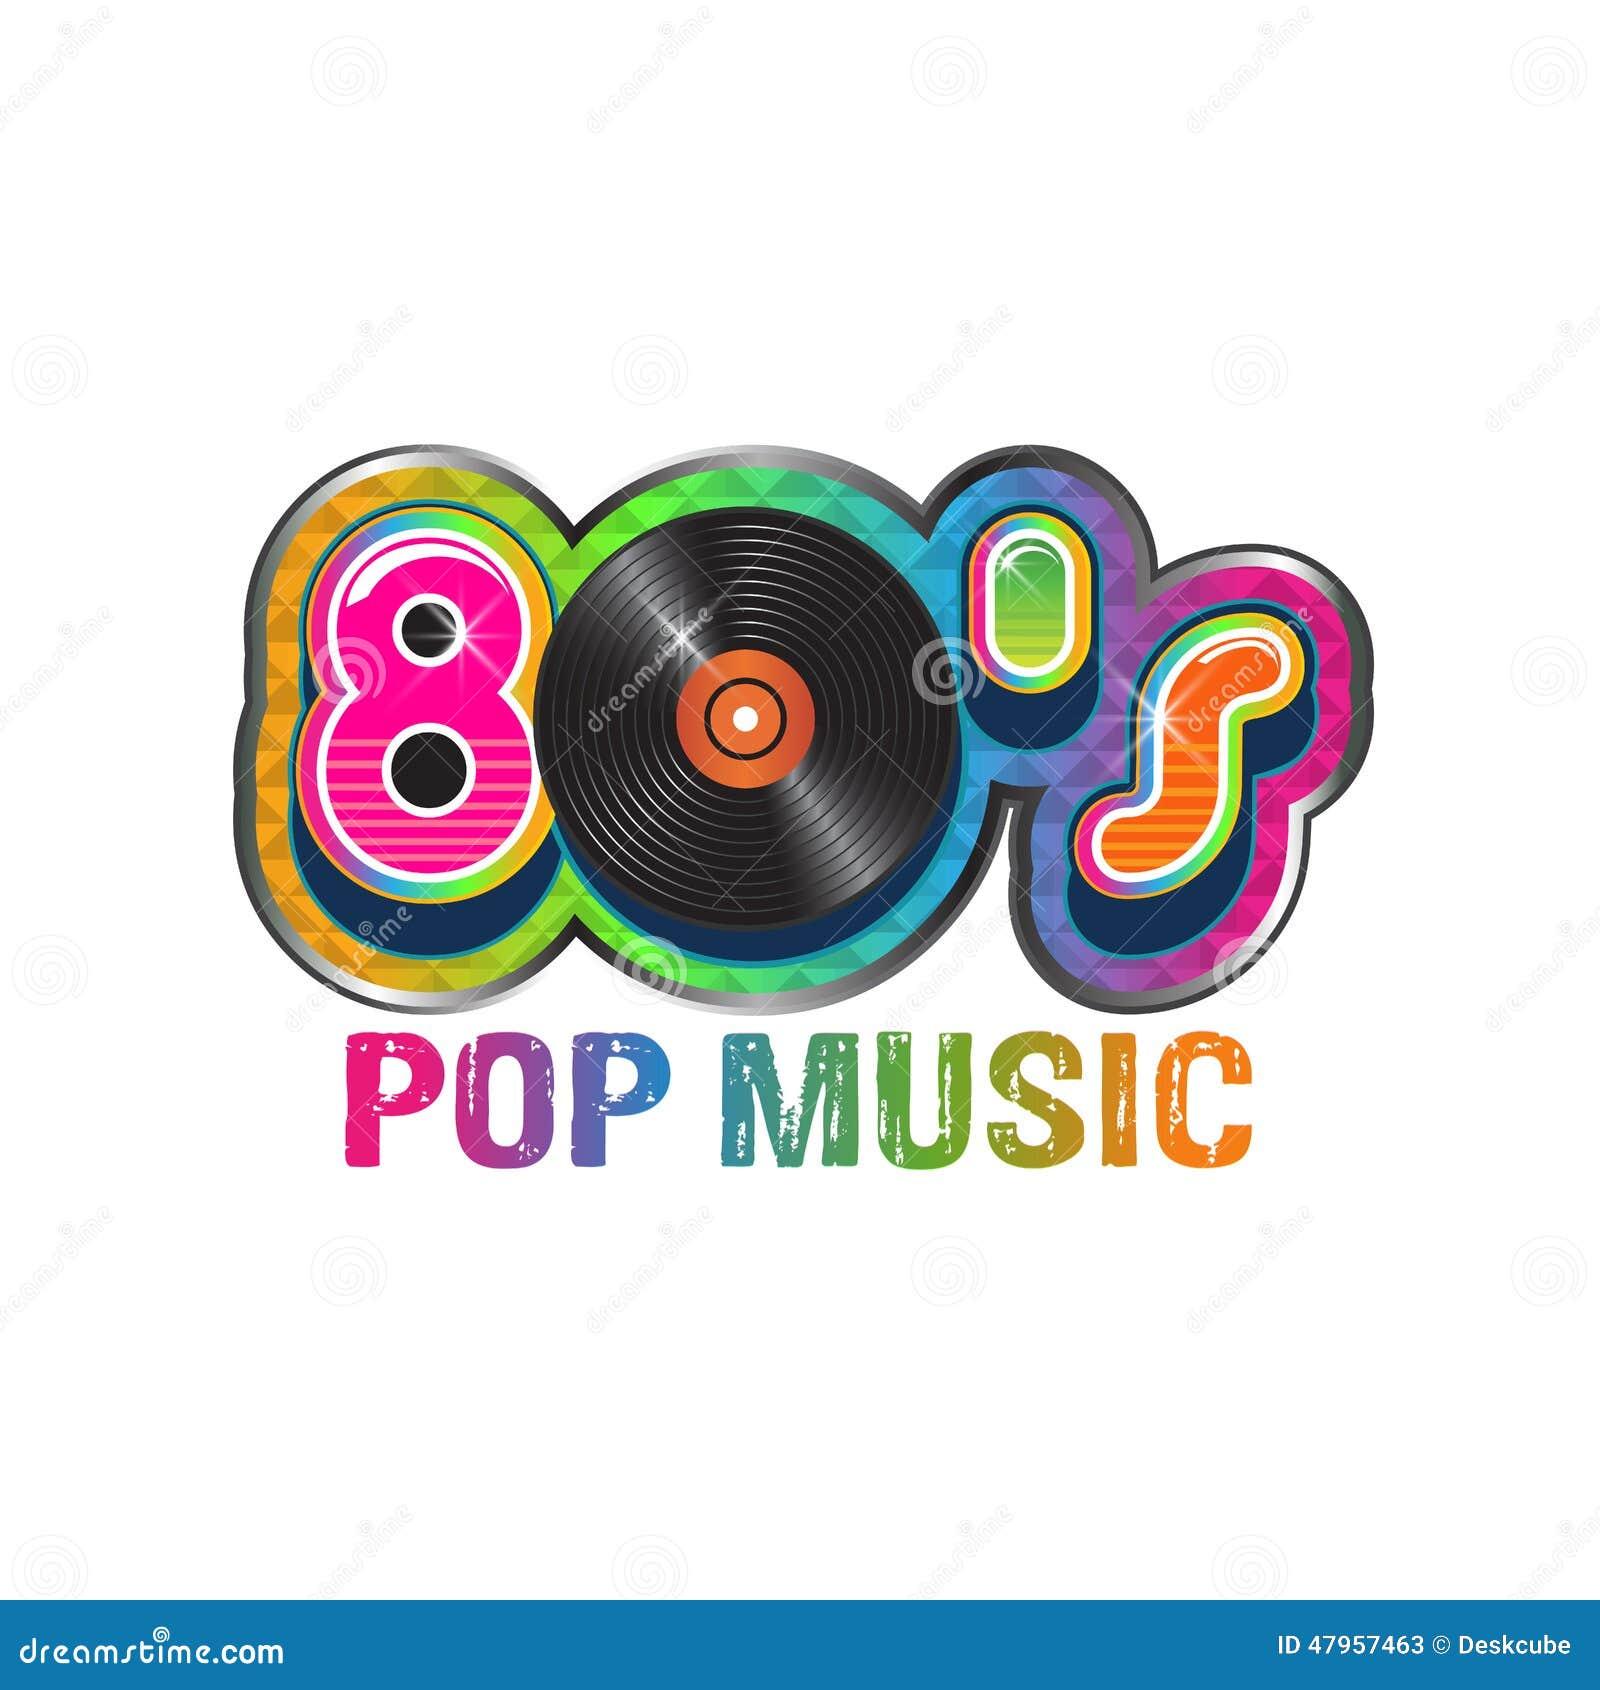 80s pop music vinyl disc  stock vector  Illustration of retro - 47957463